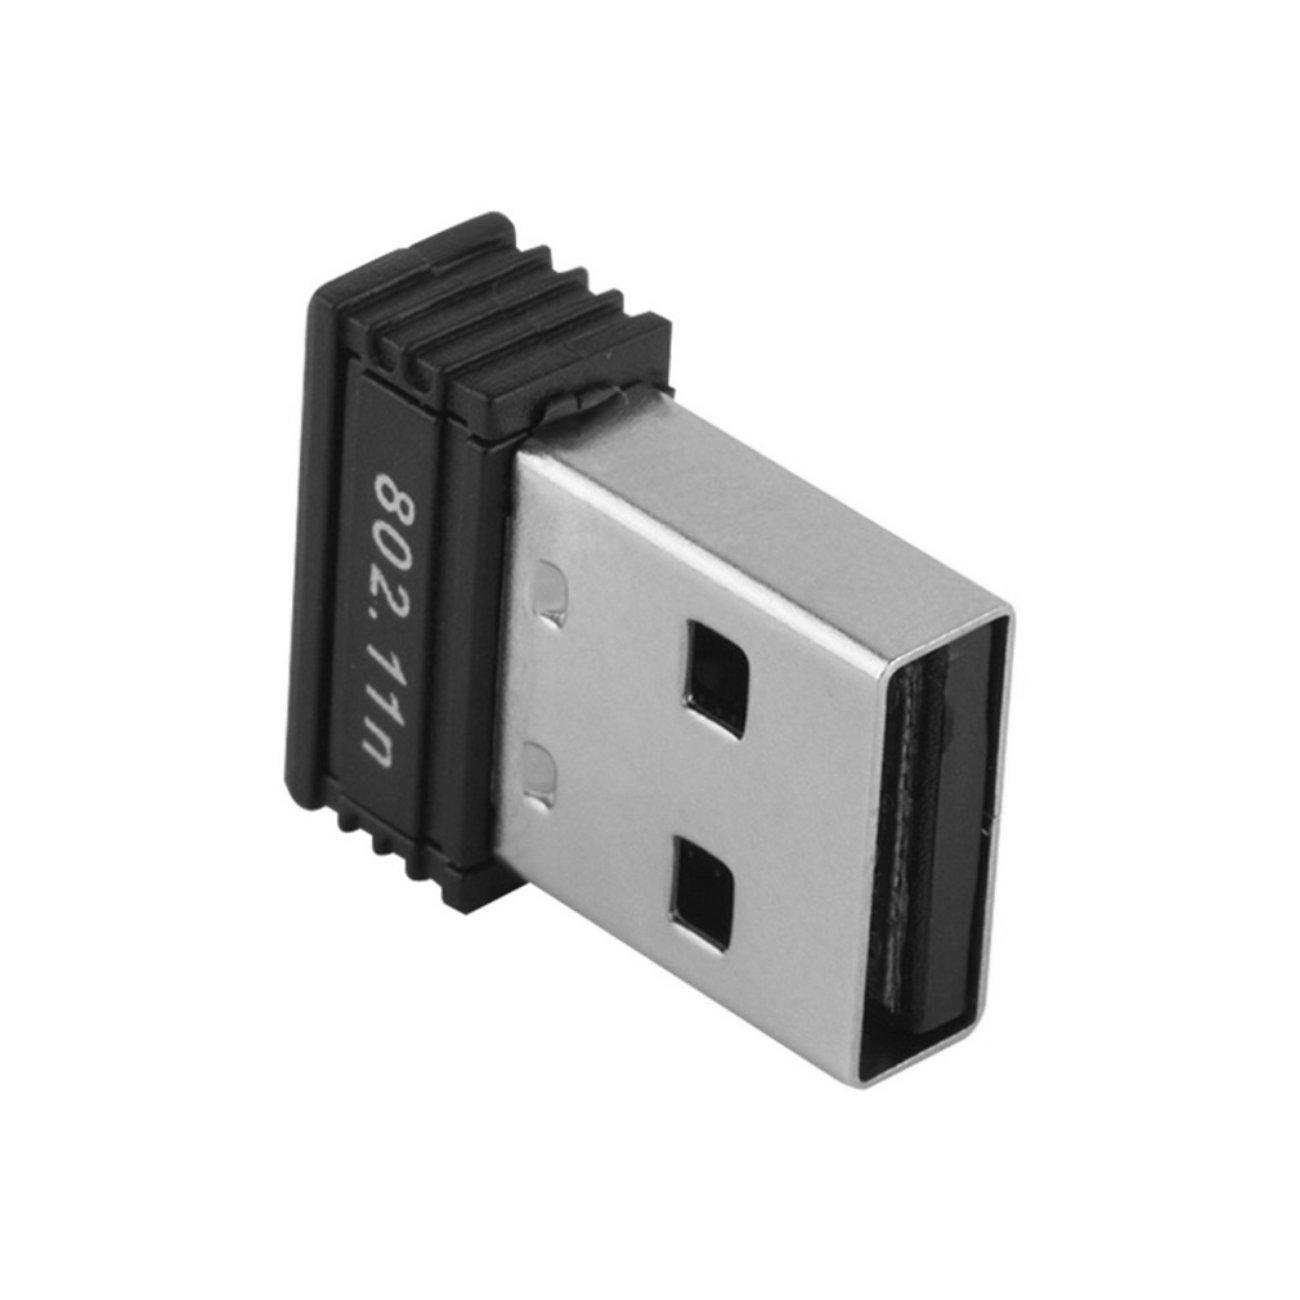 g//b Jiobapiongxin 150 Mbps 150 MB Mini-USB-WLAN-WLAN-Adapter Netzwerk-LAN-Karte 802.11n